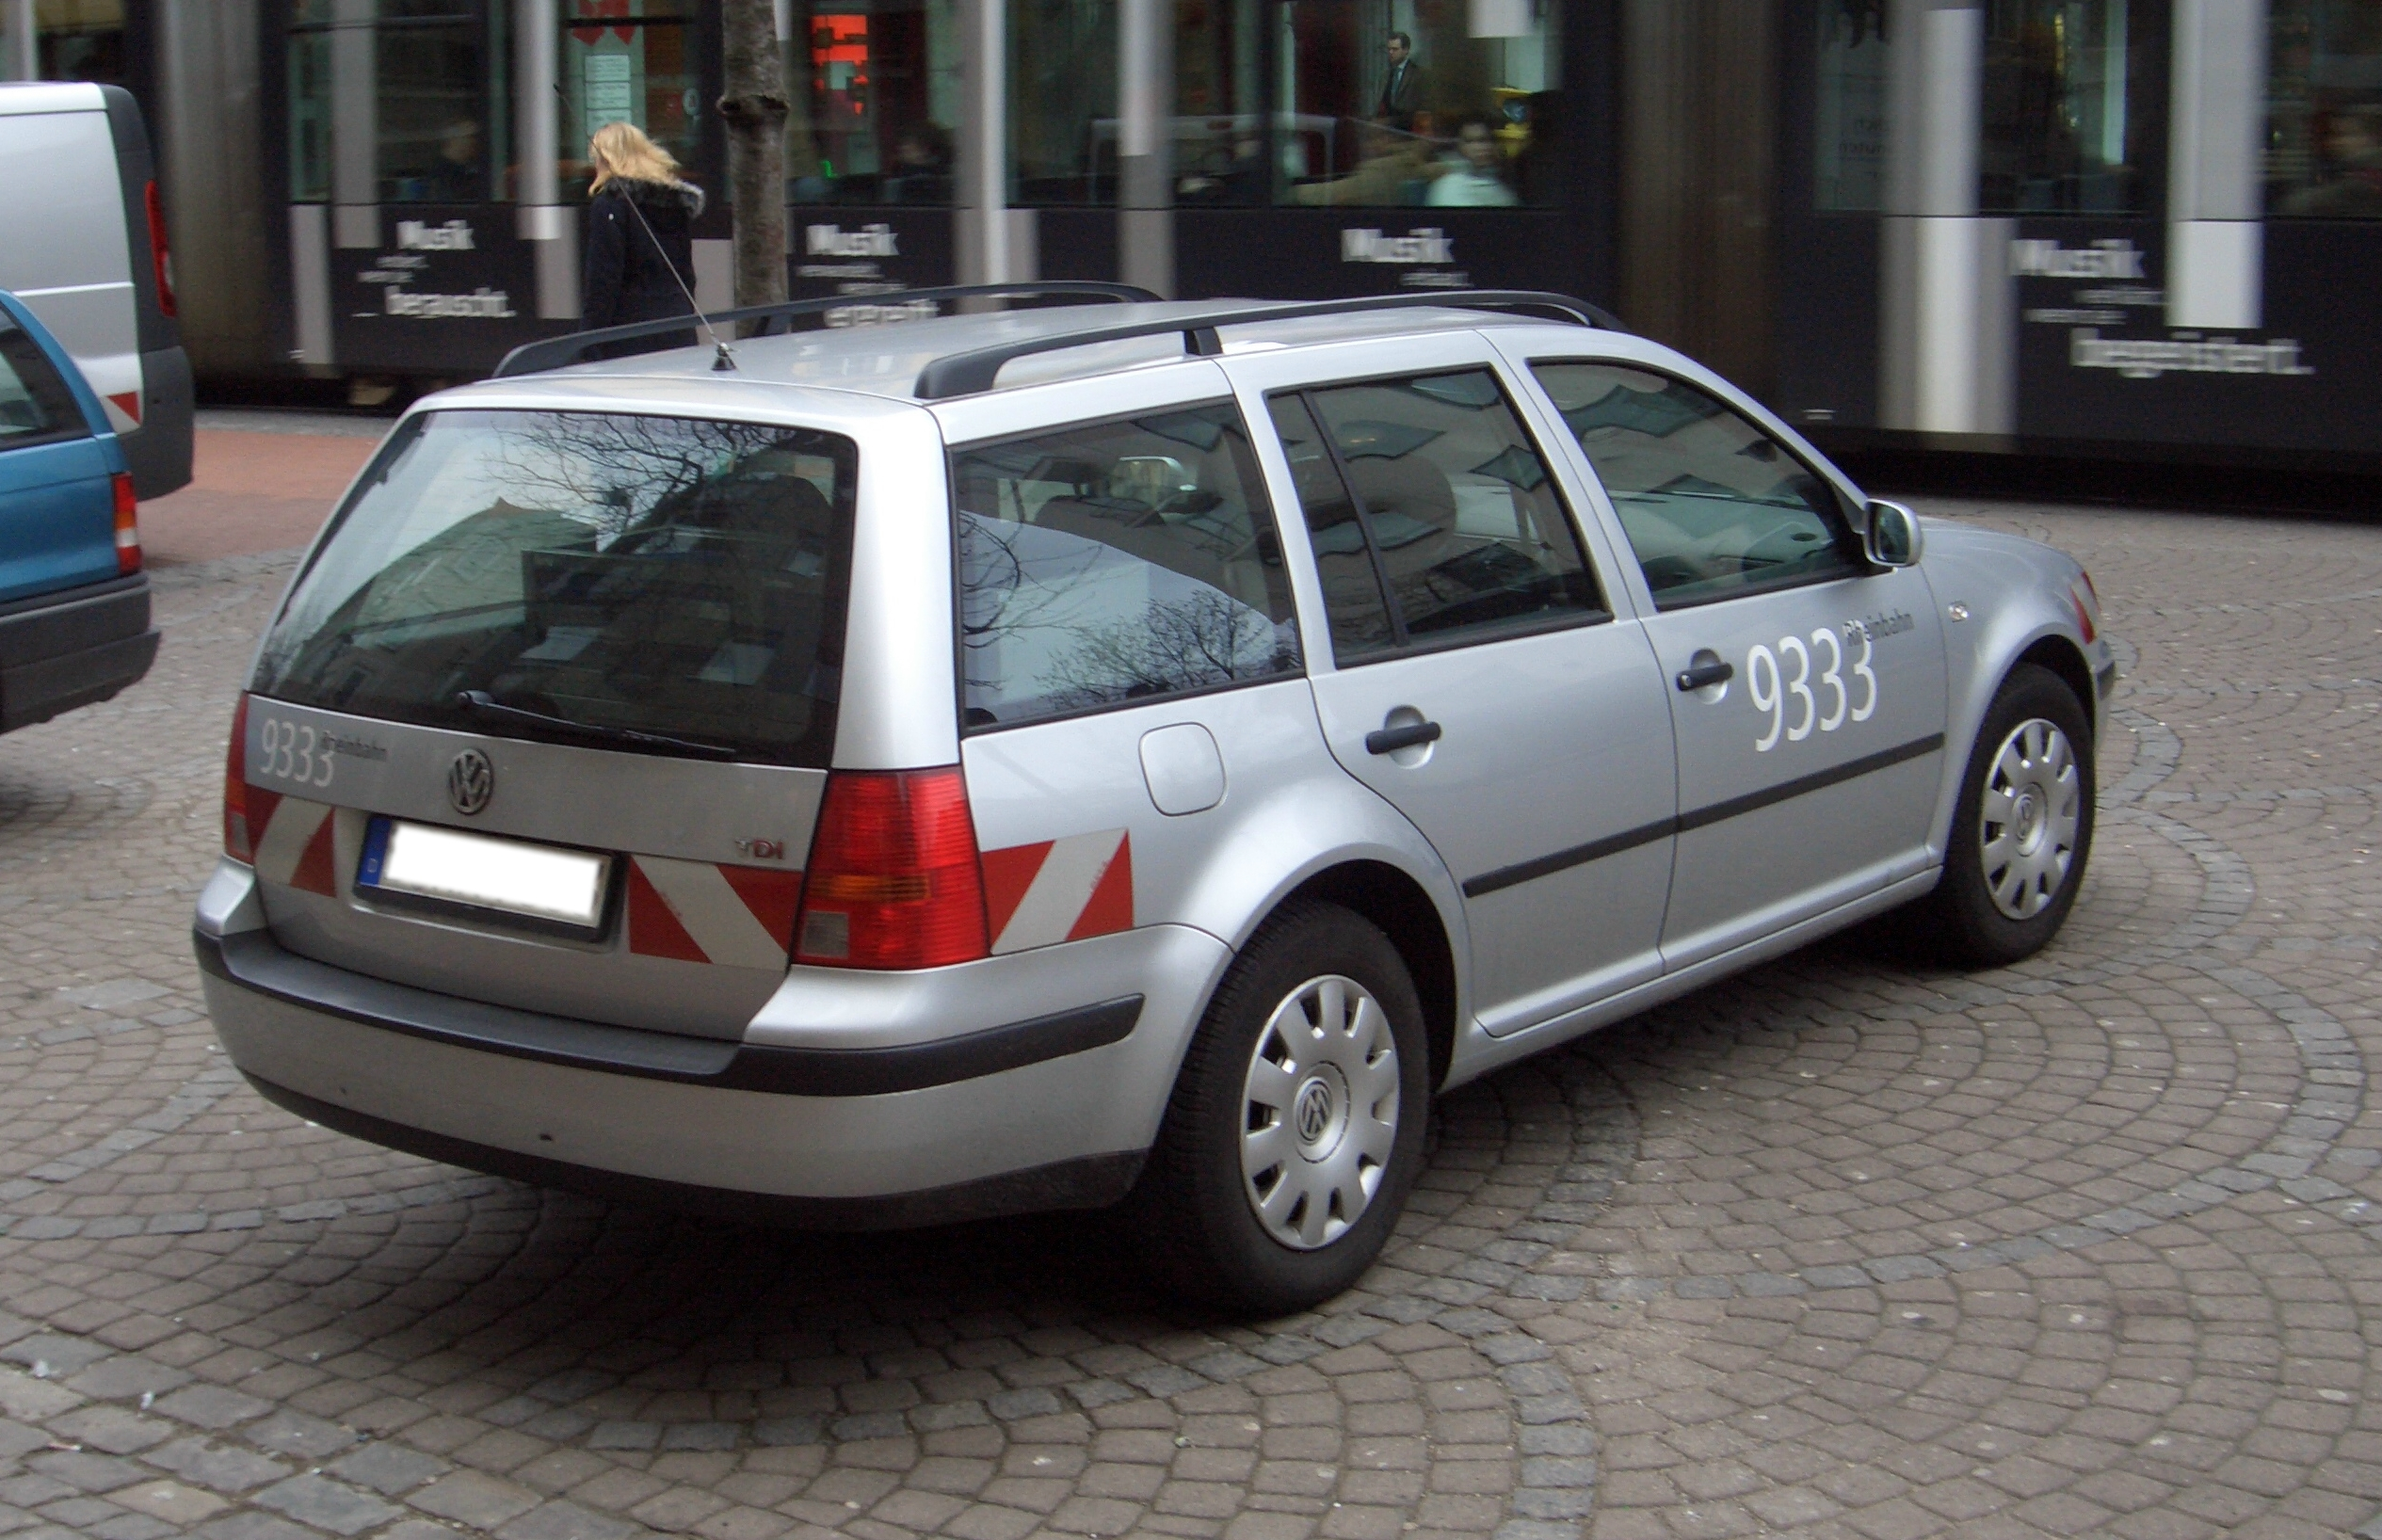 Viewtopic as well Eurp 1105 1990 Volkswagen Corrado G60 also File Volkswagen Sagitar II rear China 2012 05 04 moreover 2016 Astra moreover 1990 Diablo. on volkswagen jetta wagon